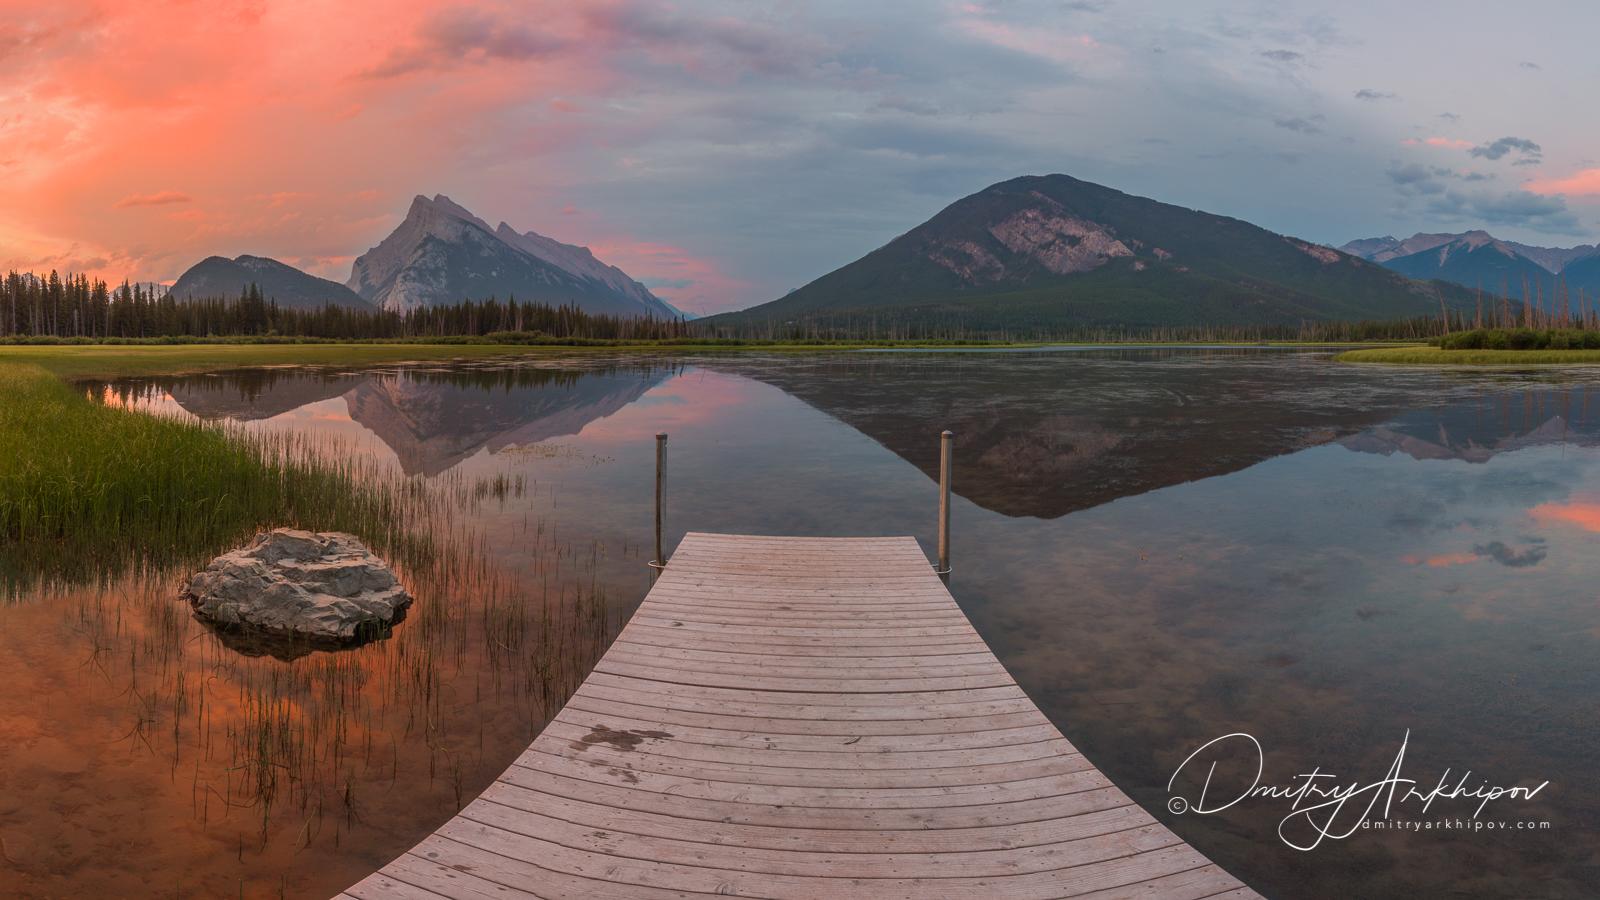 Bow Lake, Канада, красивое озеро